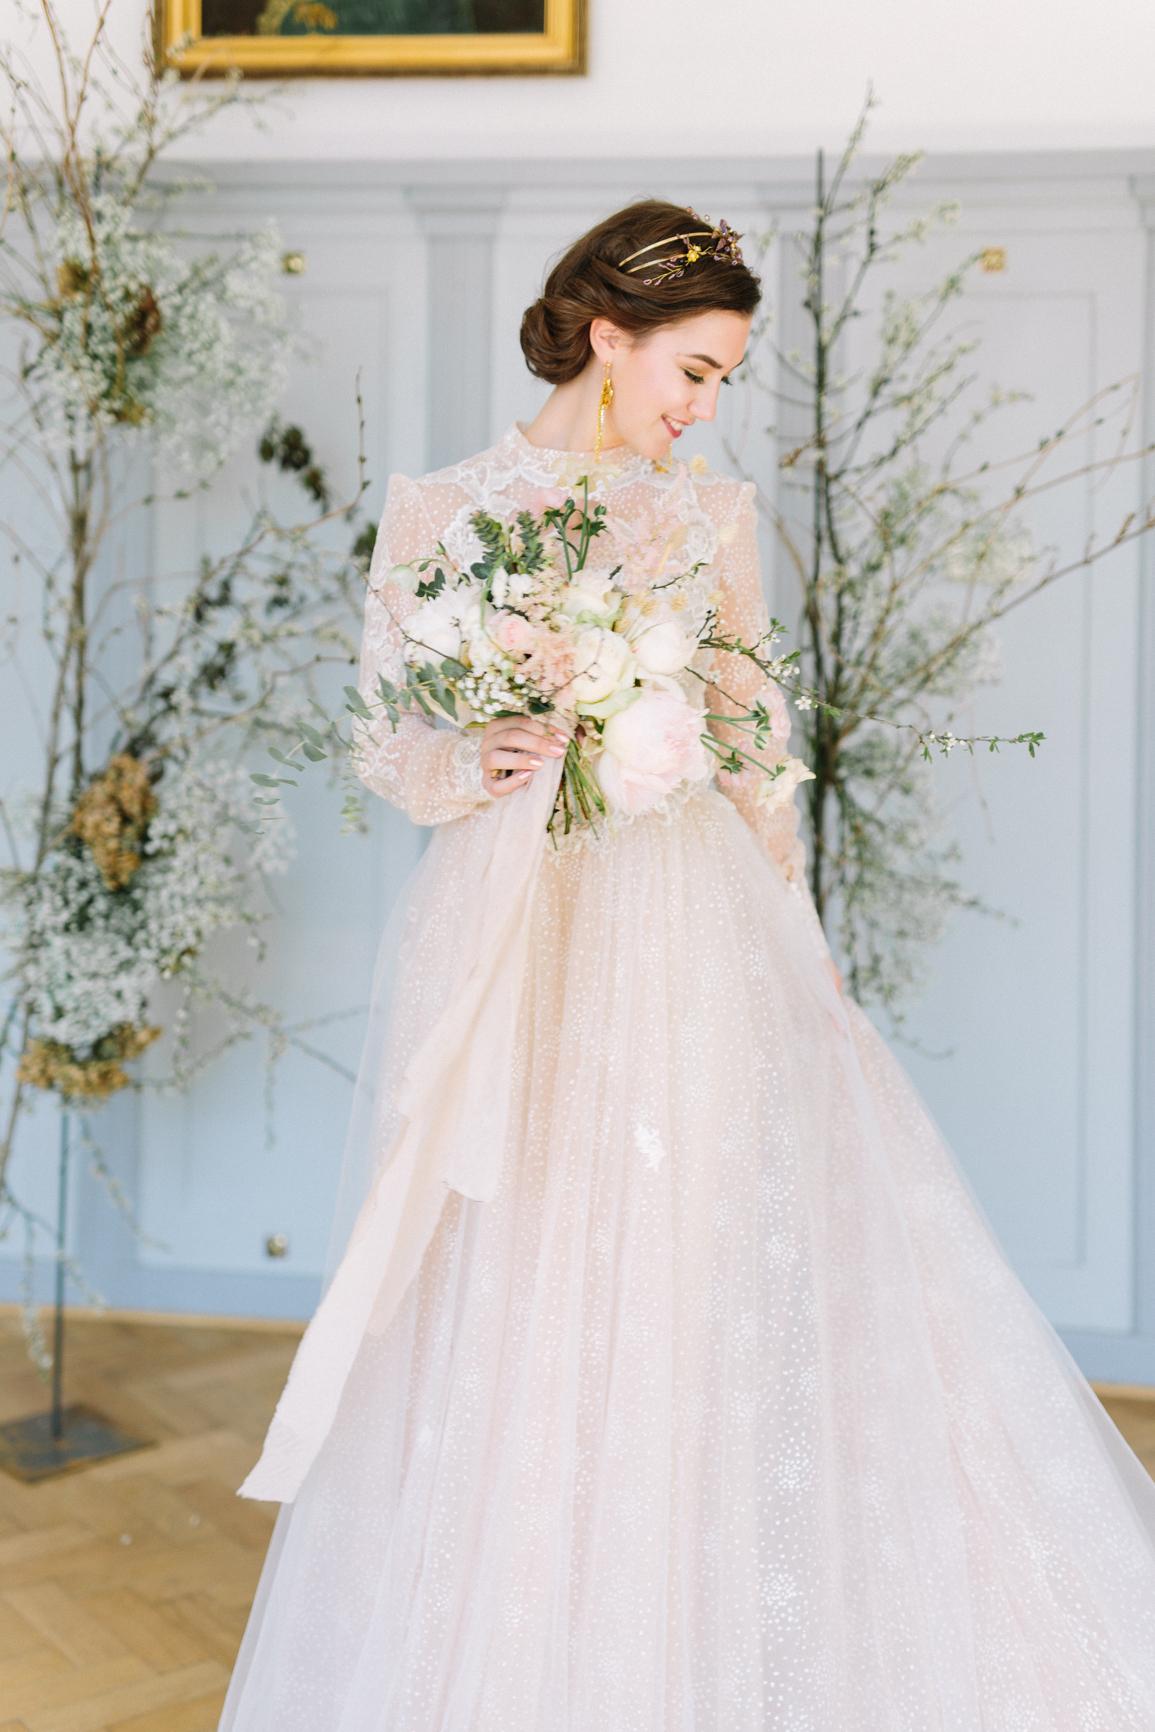 H&M: Atelier Maskerade | Foto: Zora-Fotografen | Planung: marrylight Hochzeitsplanung